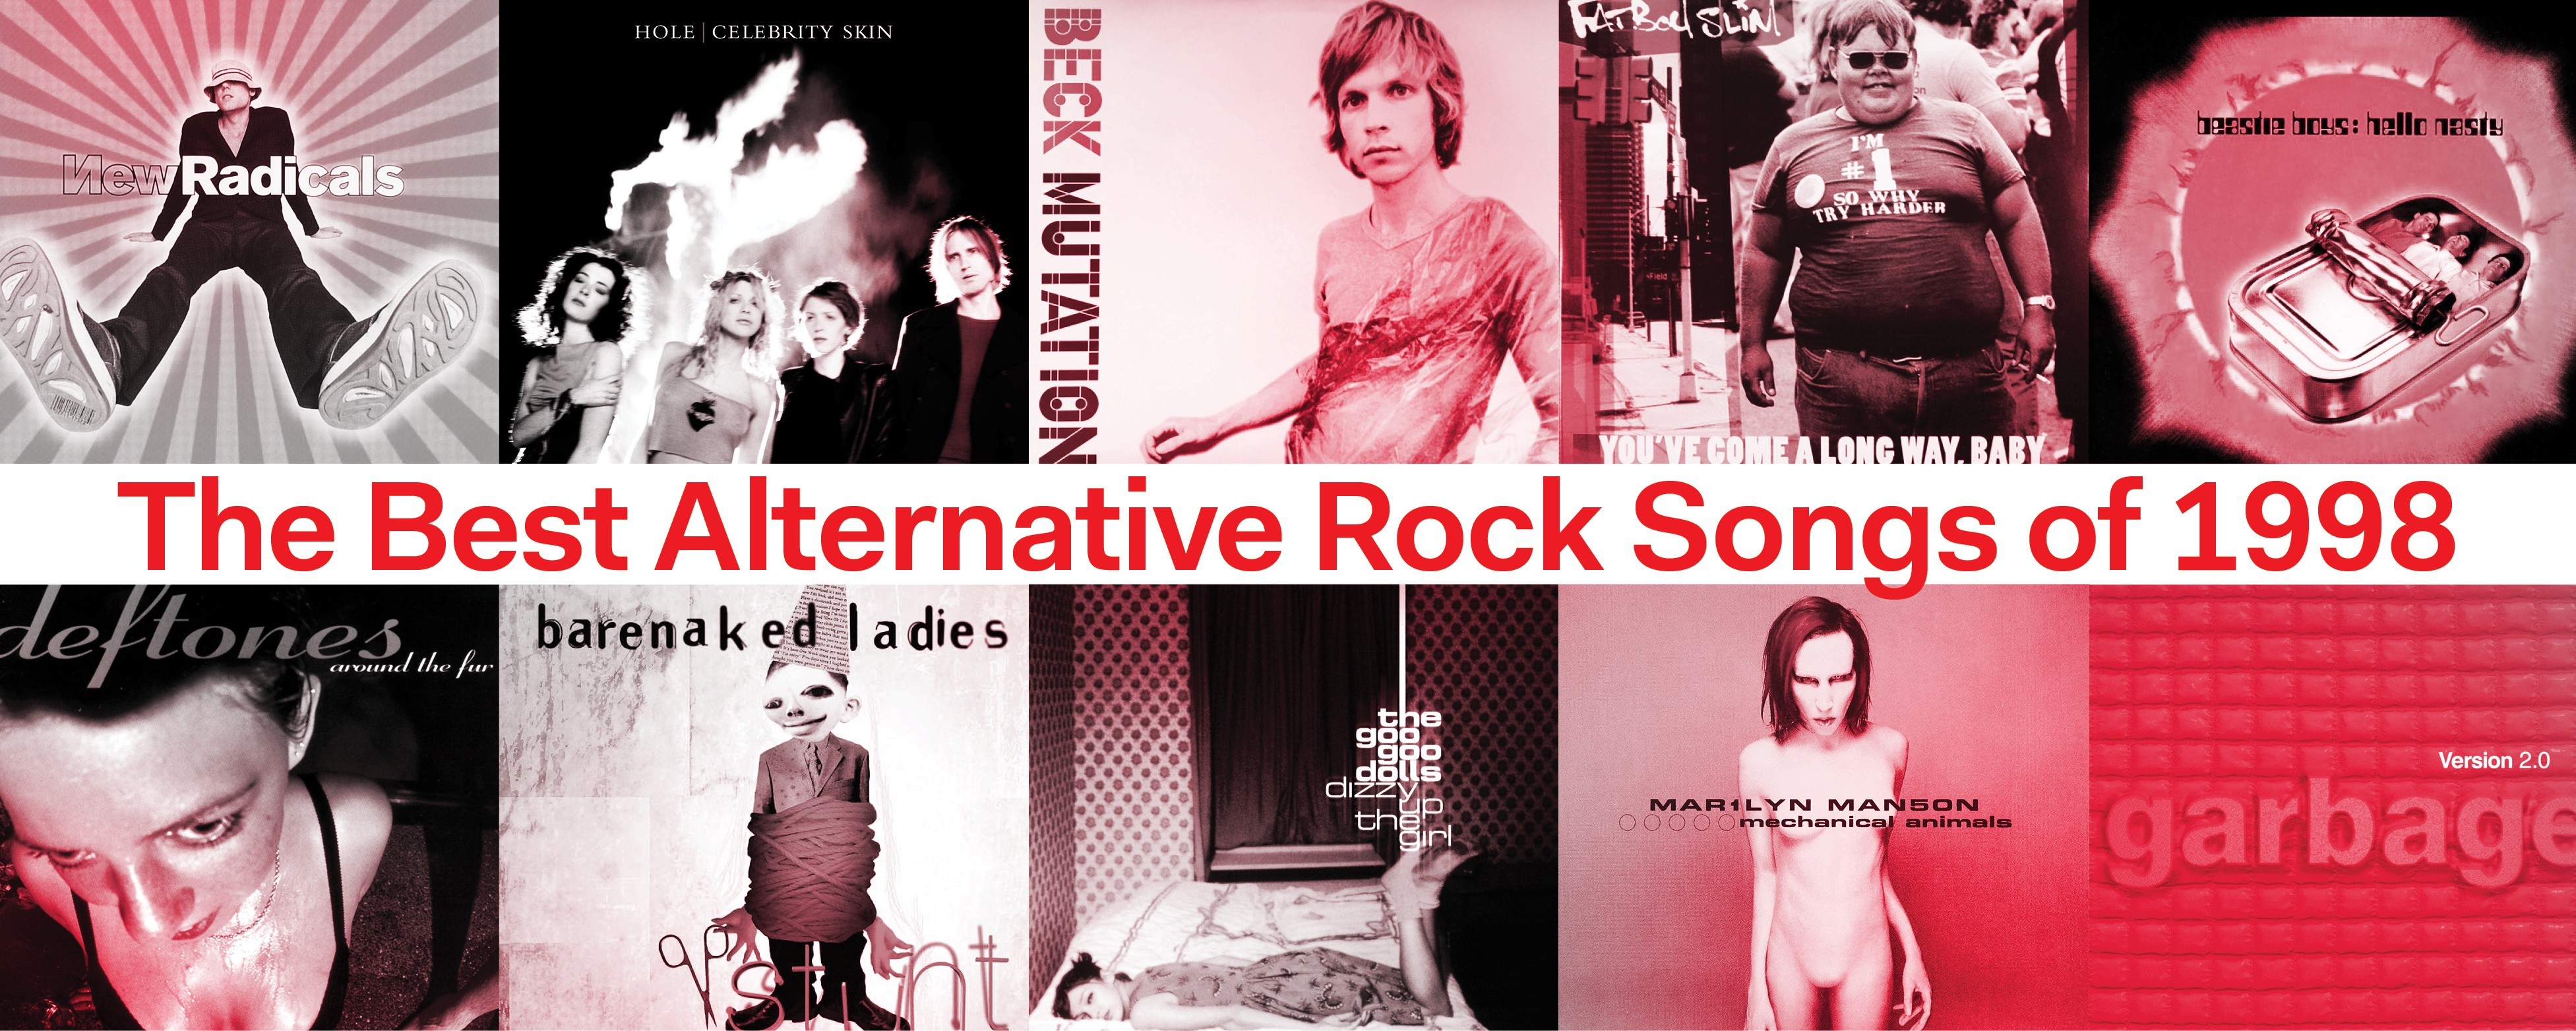 The 88 Best Alternative Rock Songs of 1998